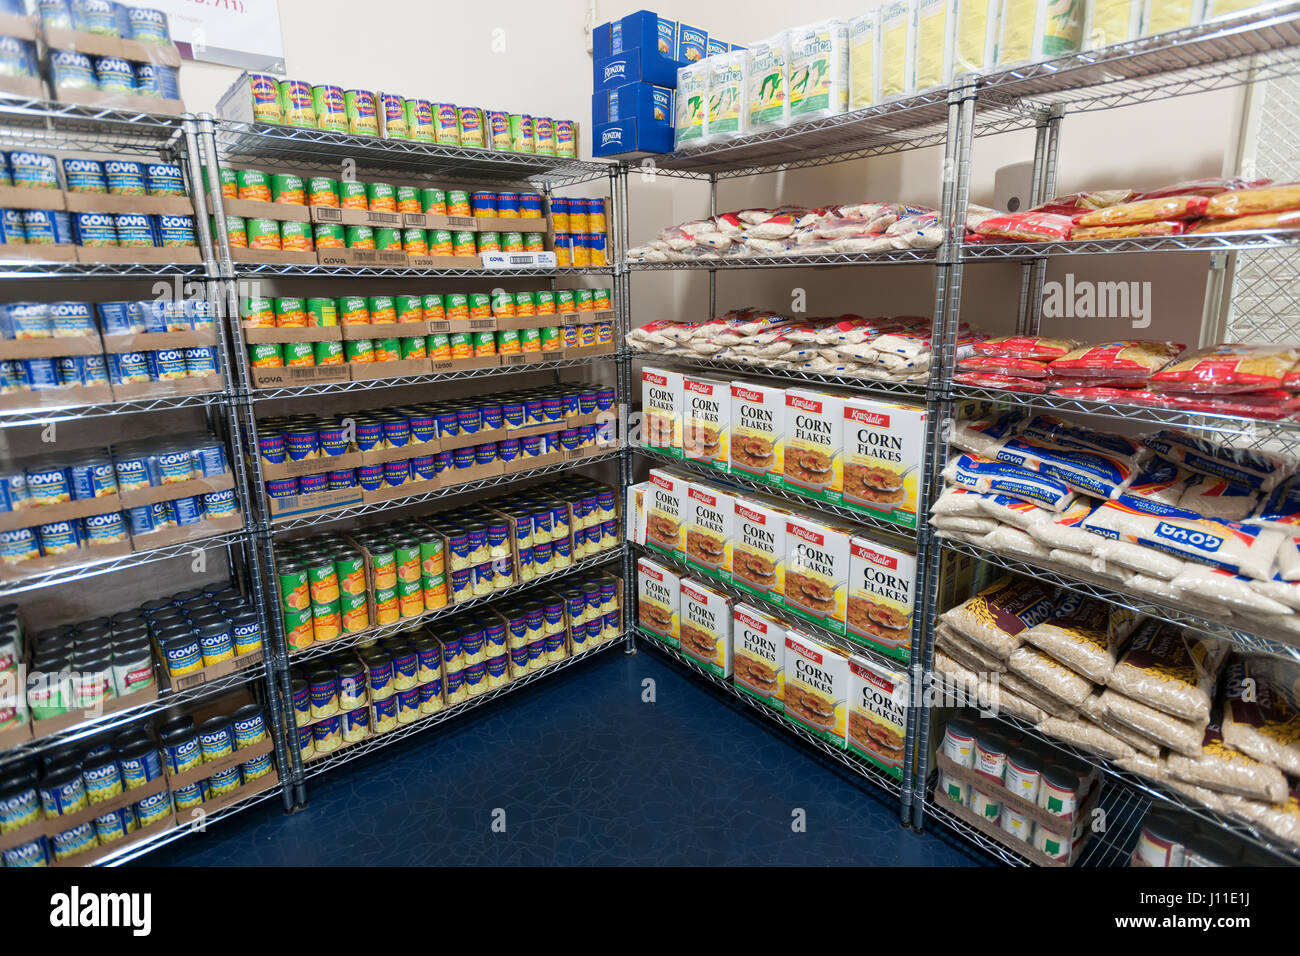 Catholic Charities Bronx Food Distribution Center In New